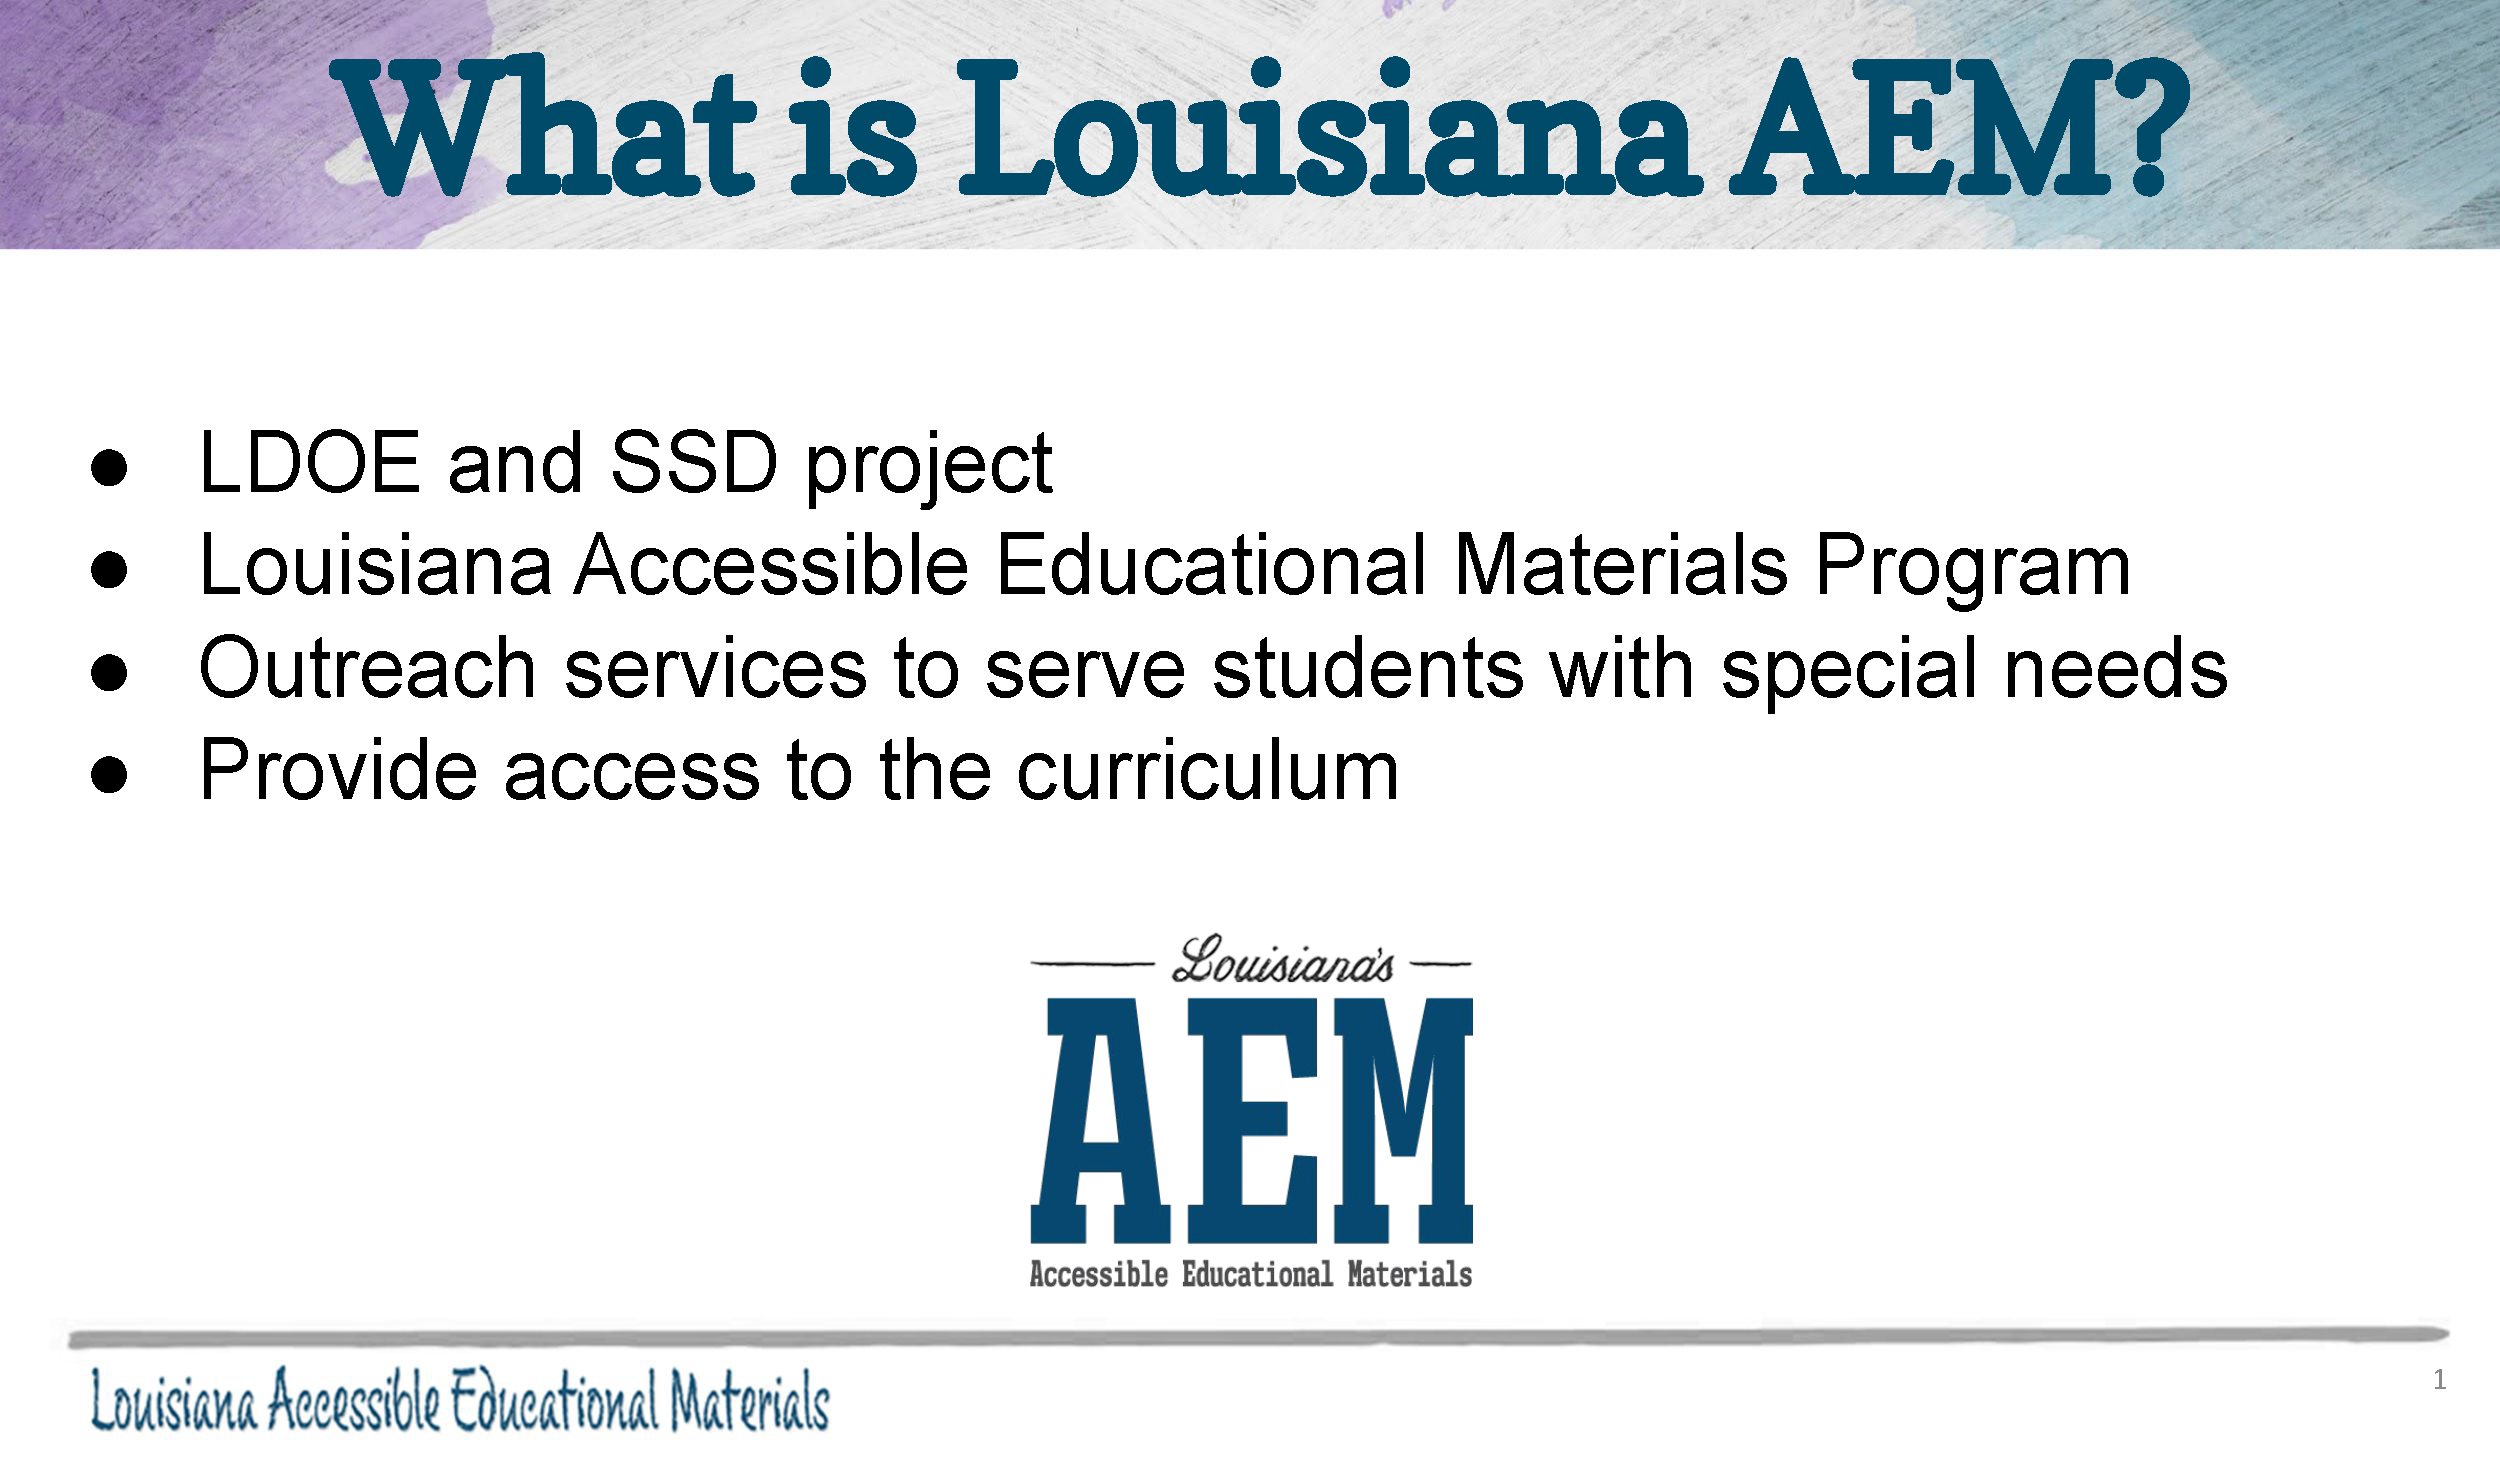 What is Louisiana AEM?